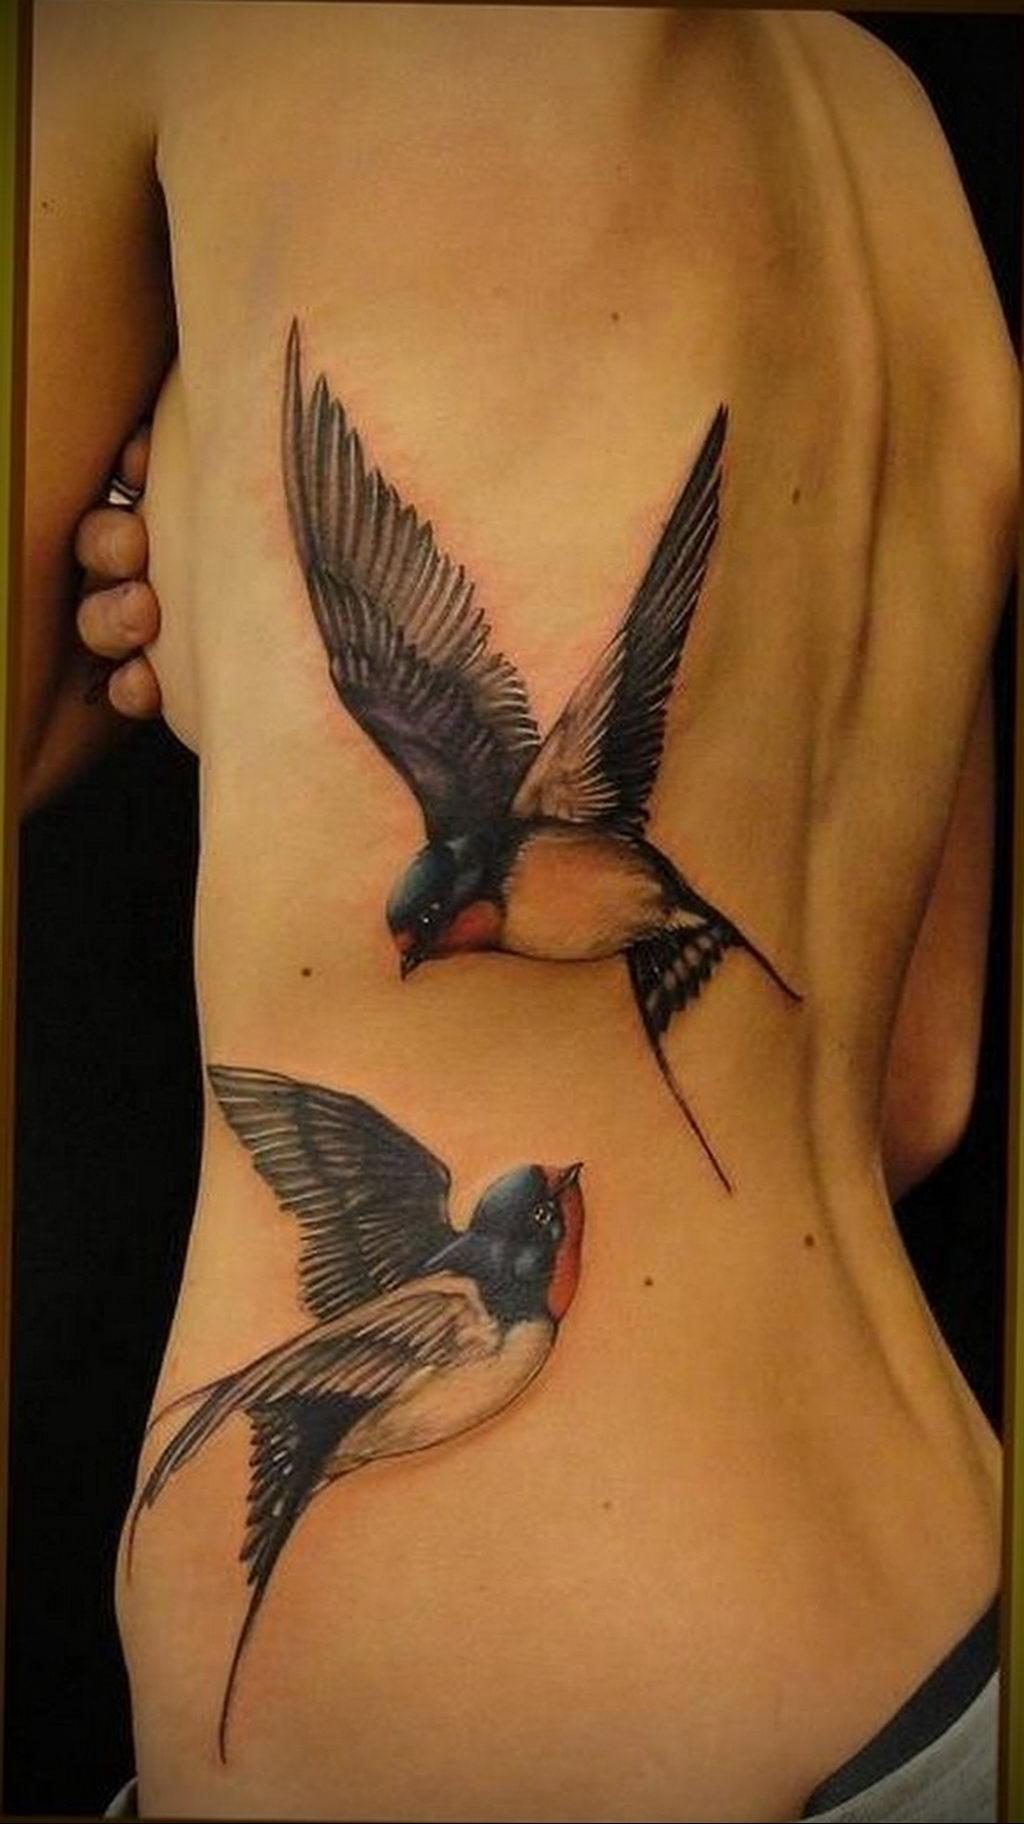 Фото тату про любовь рисунок Птица 03.02.2020 №019 -bird tattoo- tatufoto.com